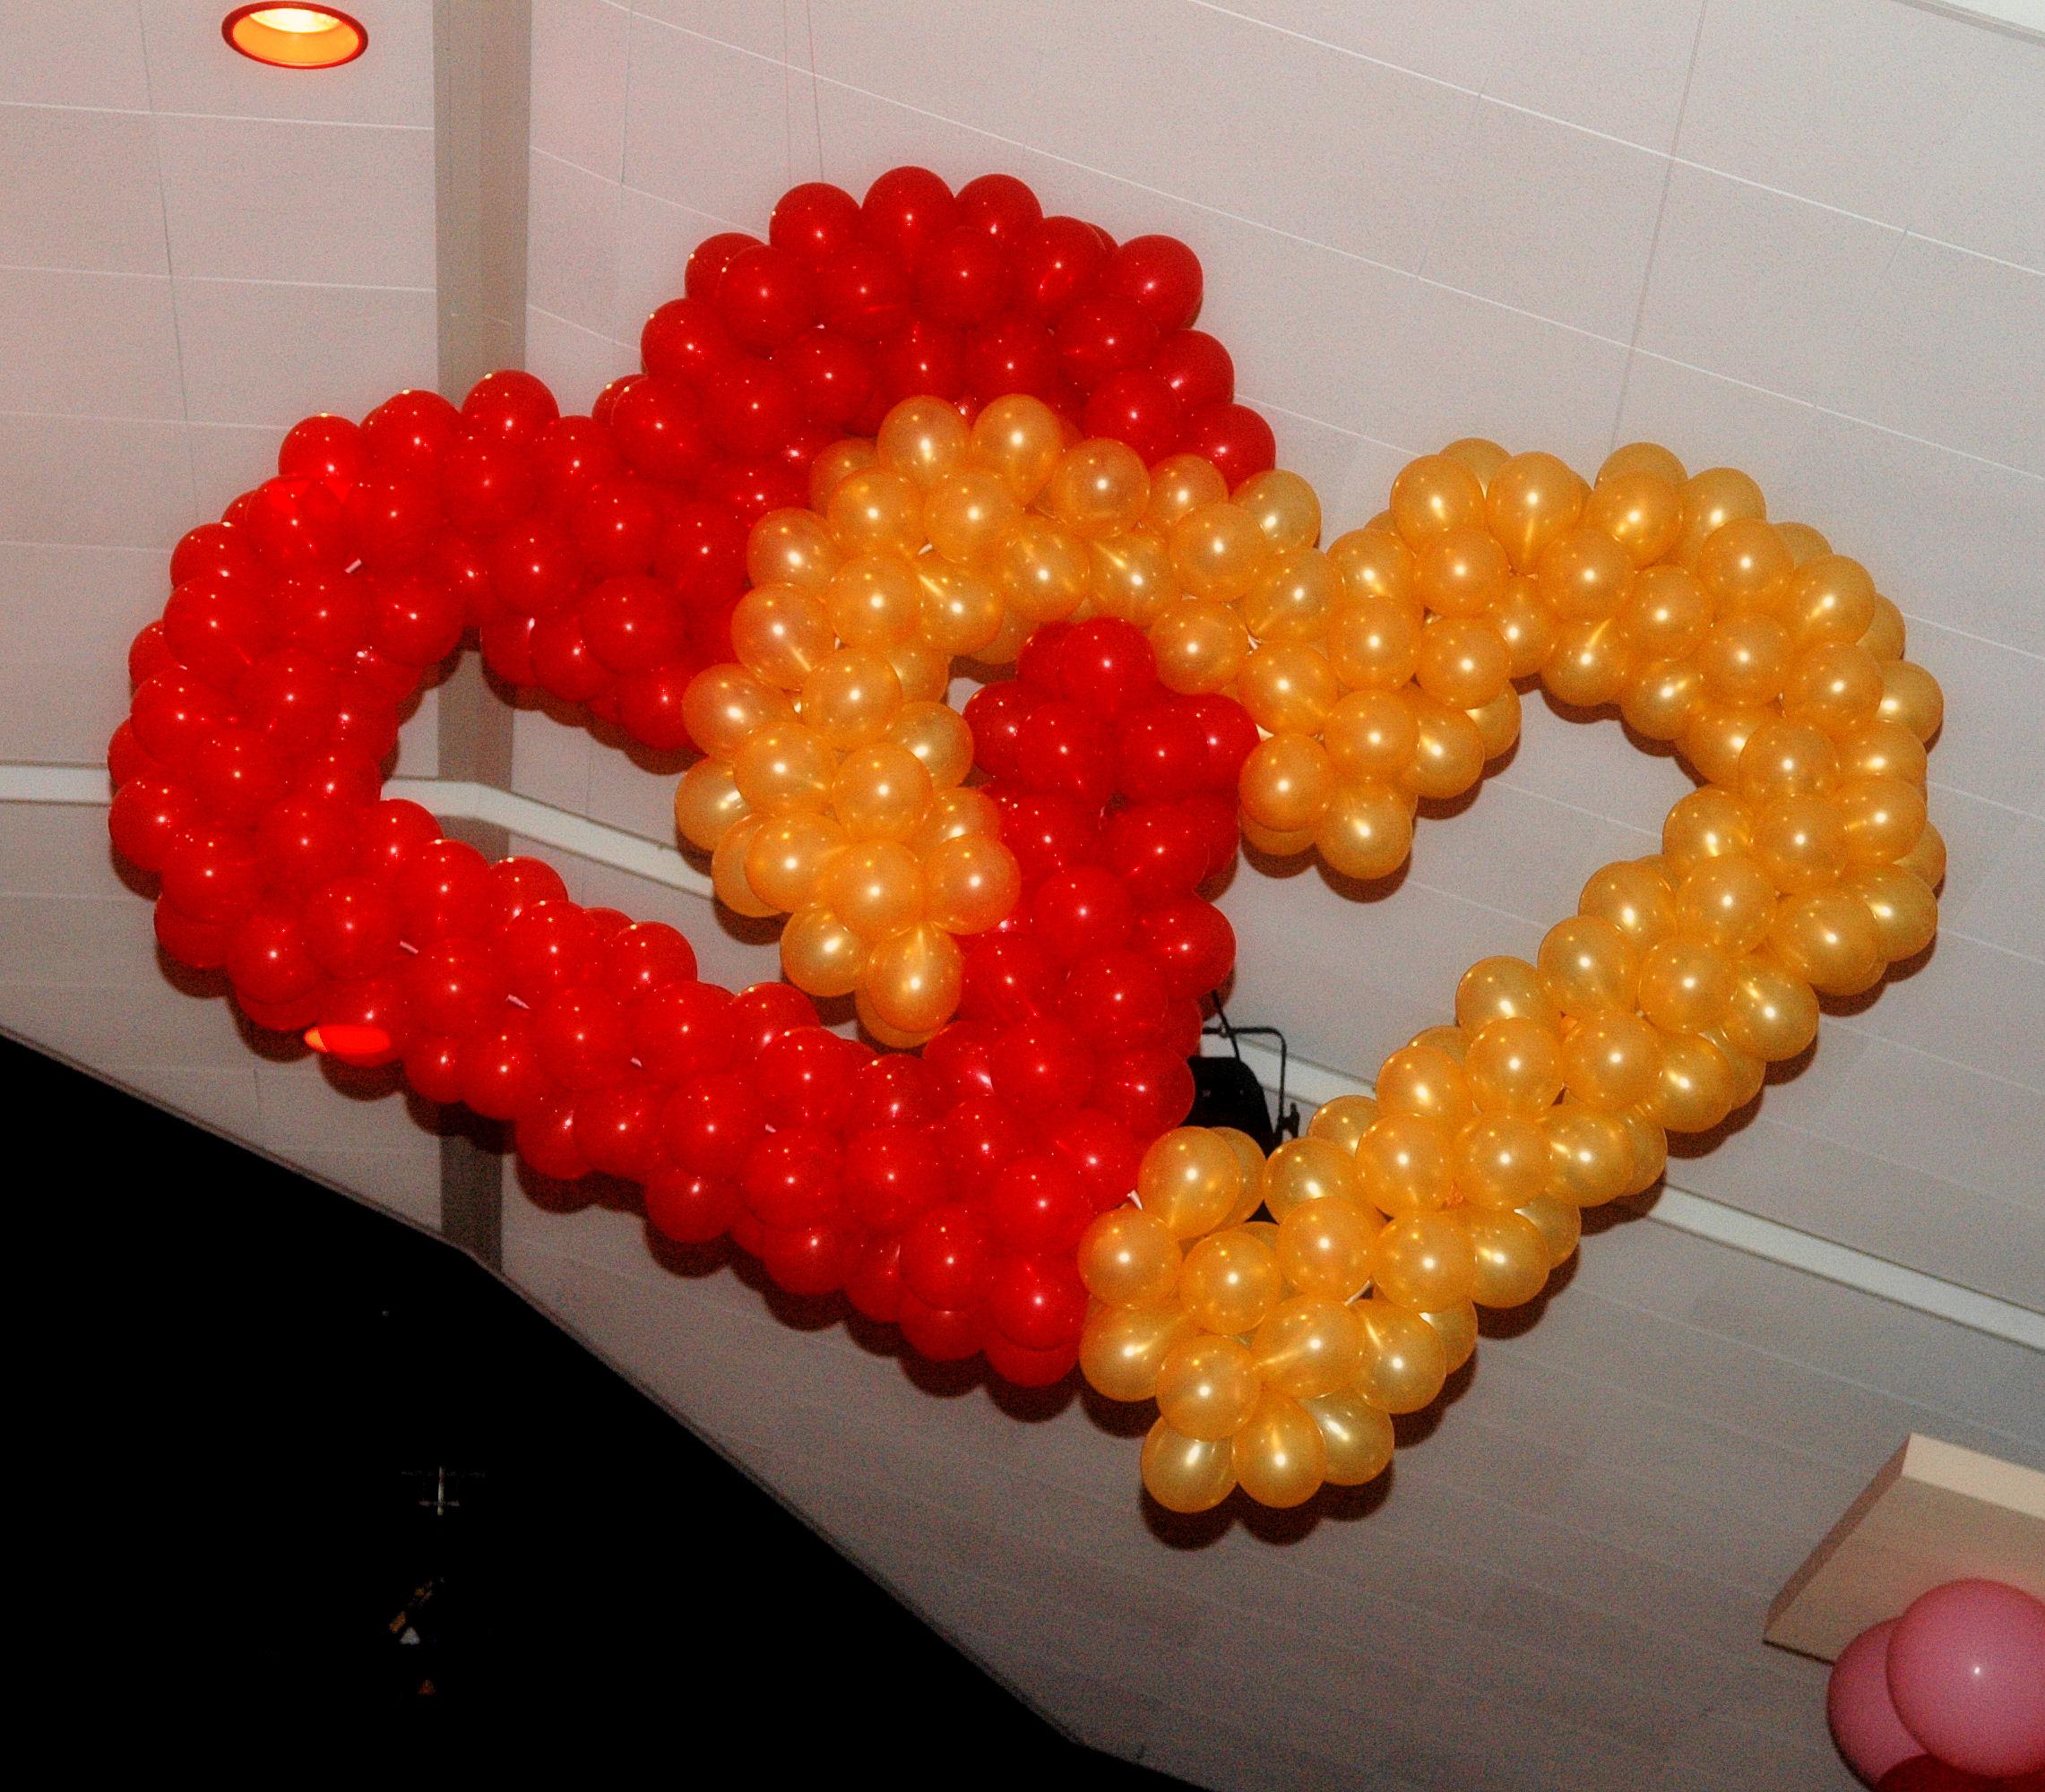 Ballonnendecoratie - Ballonnenharten in elkaar gevlochten gemaakt van 5 inch ballonnen